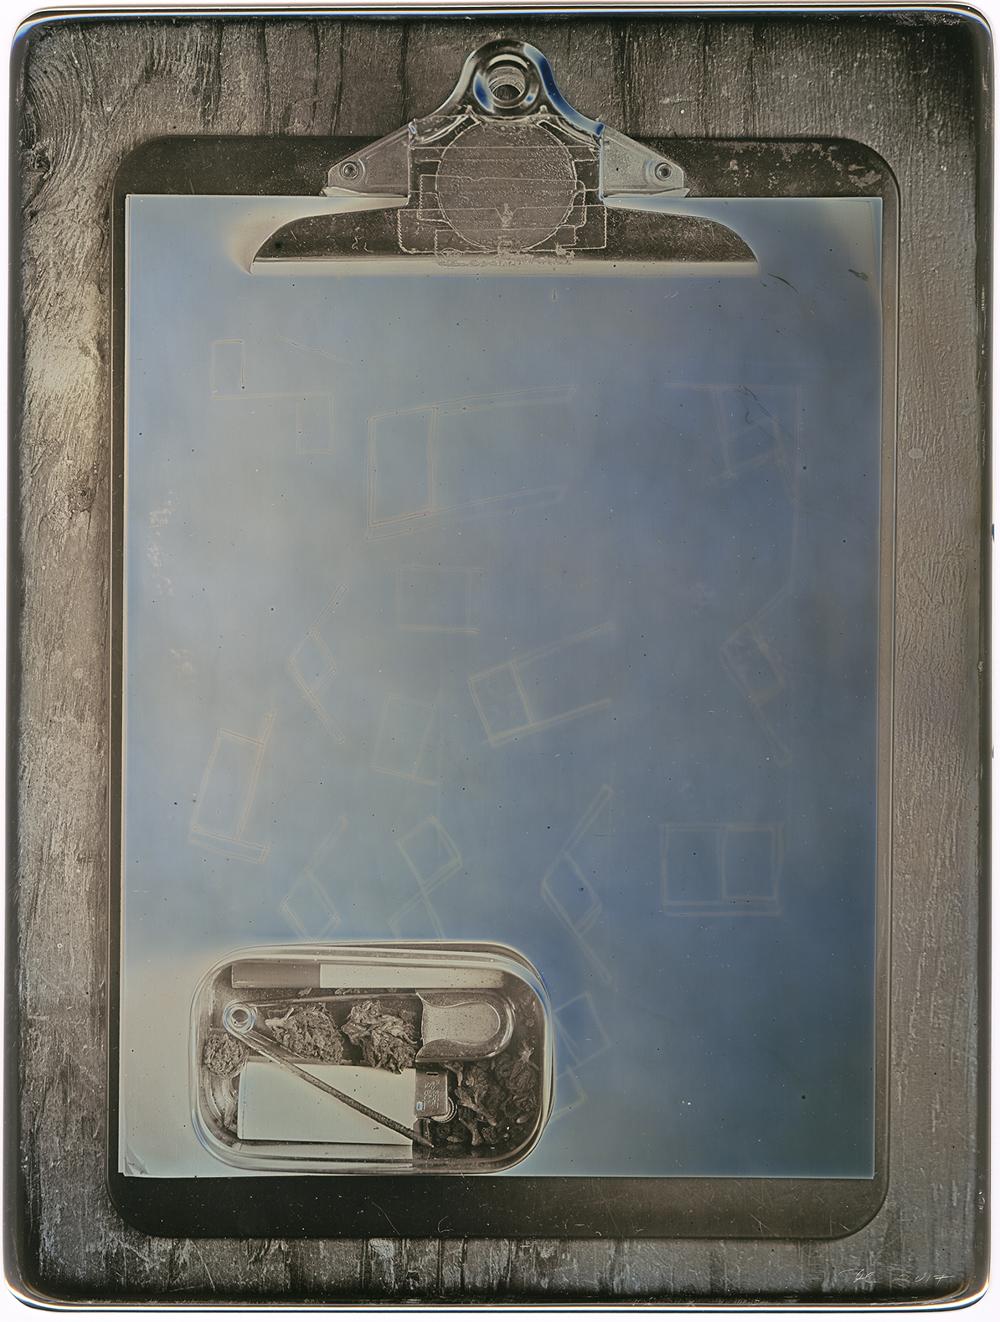 Daniel Carrillo, John Radtke's Portable Studio, 2017, daguerreotype, 8.5 x 6.5 inches, framed, $3000.